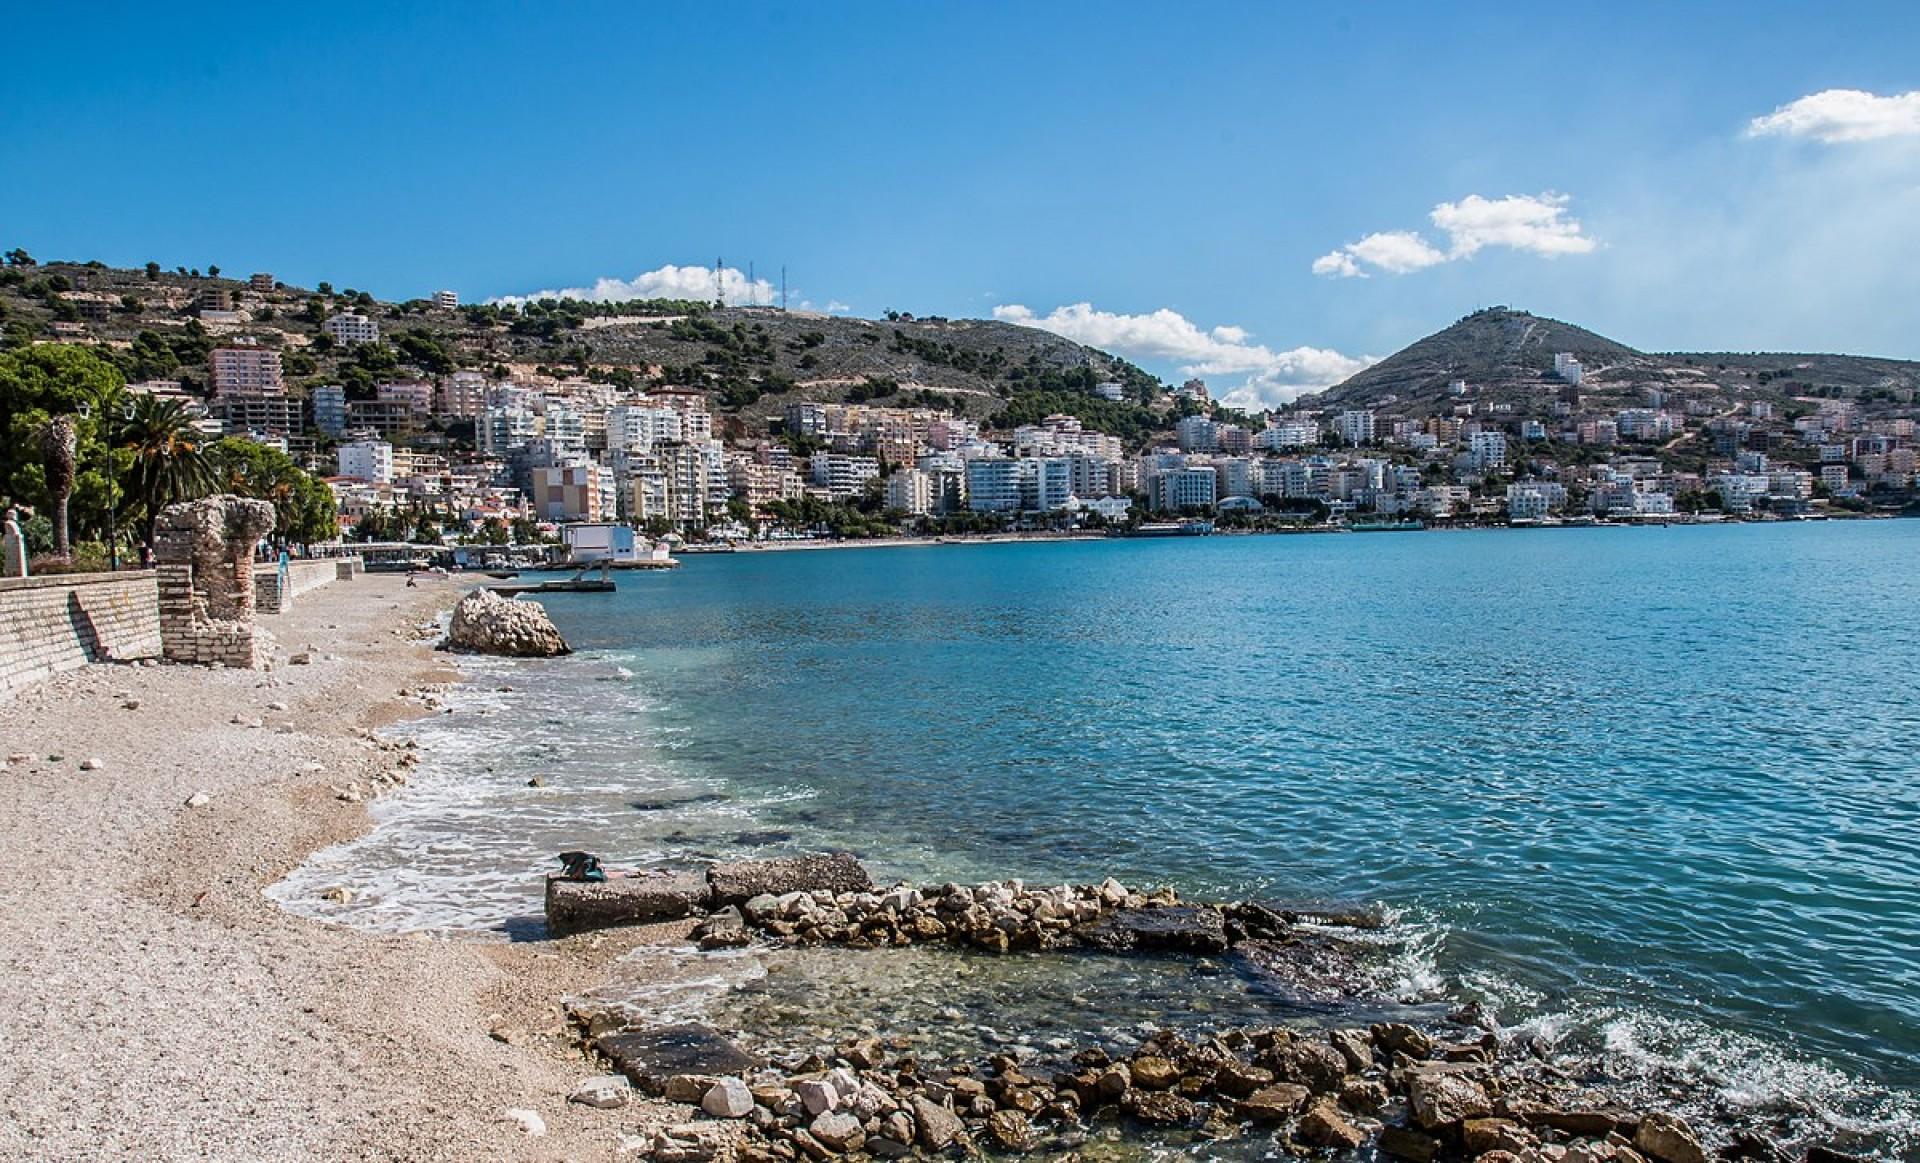 020 Tourism In Albania Essay 1200px City Of Saranda 2016 Unbelievable 1920